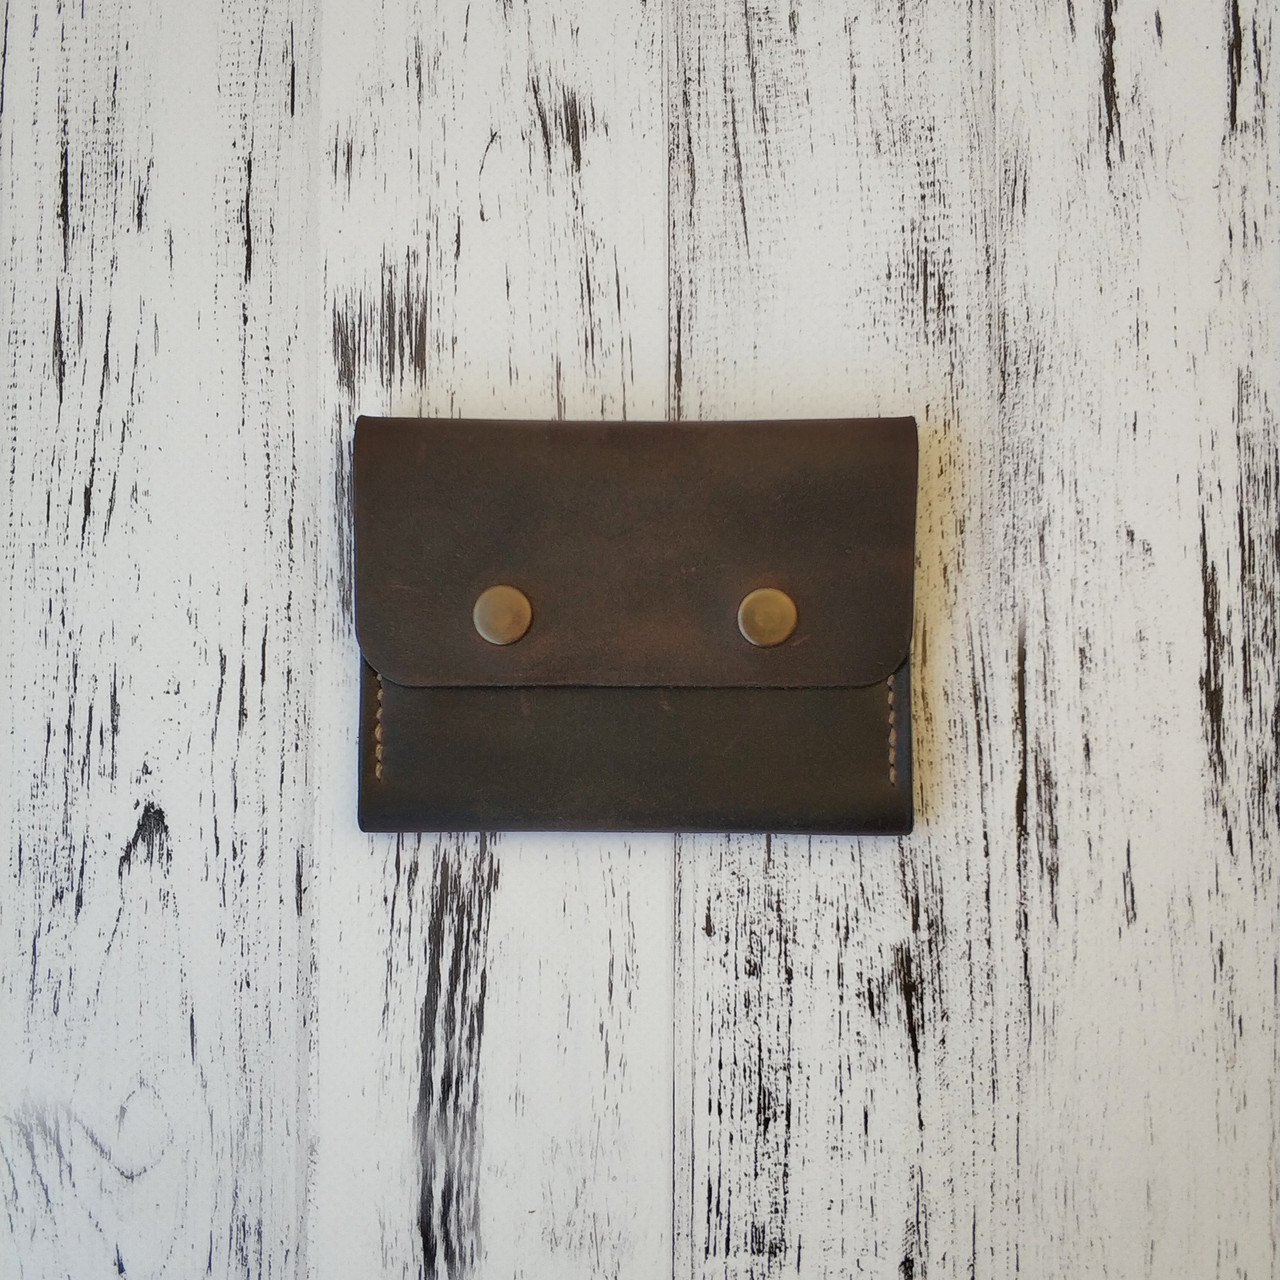 Кожаный мини кошелек Stedley